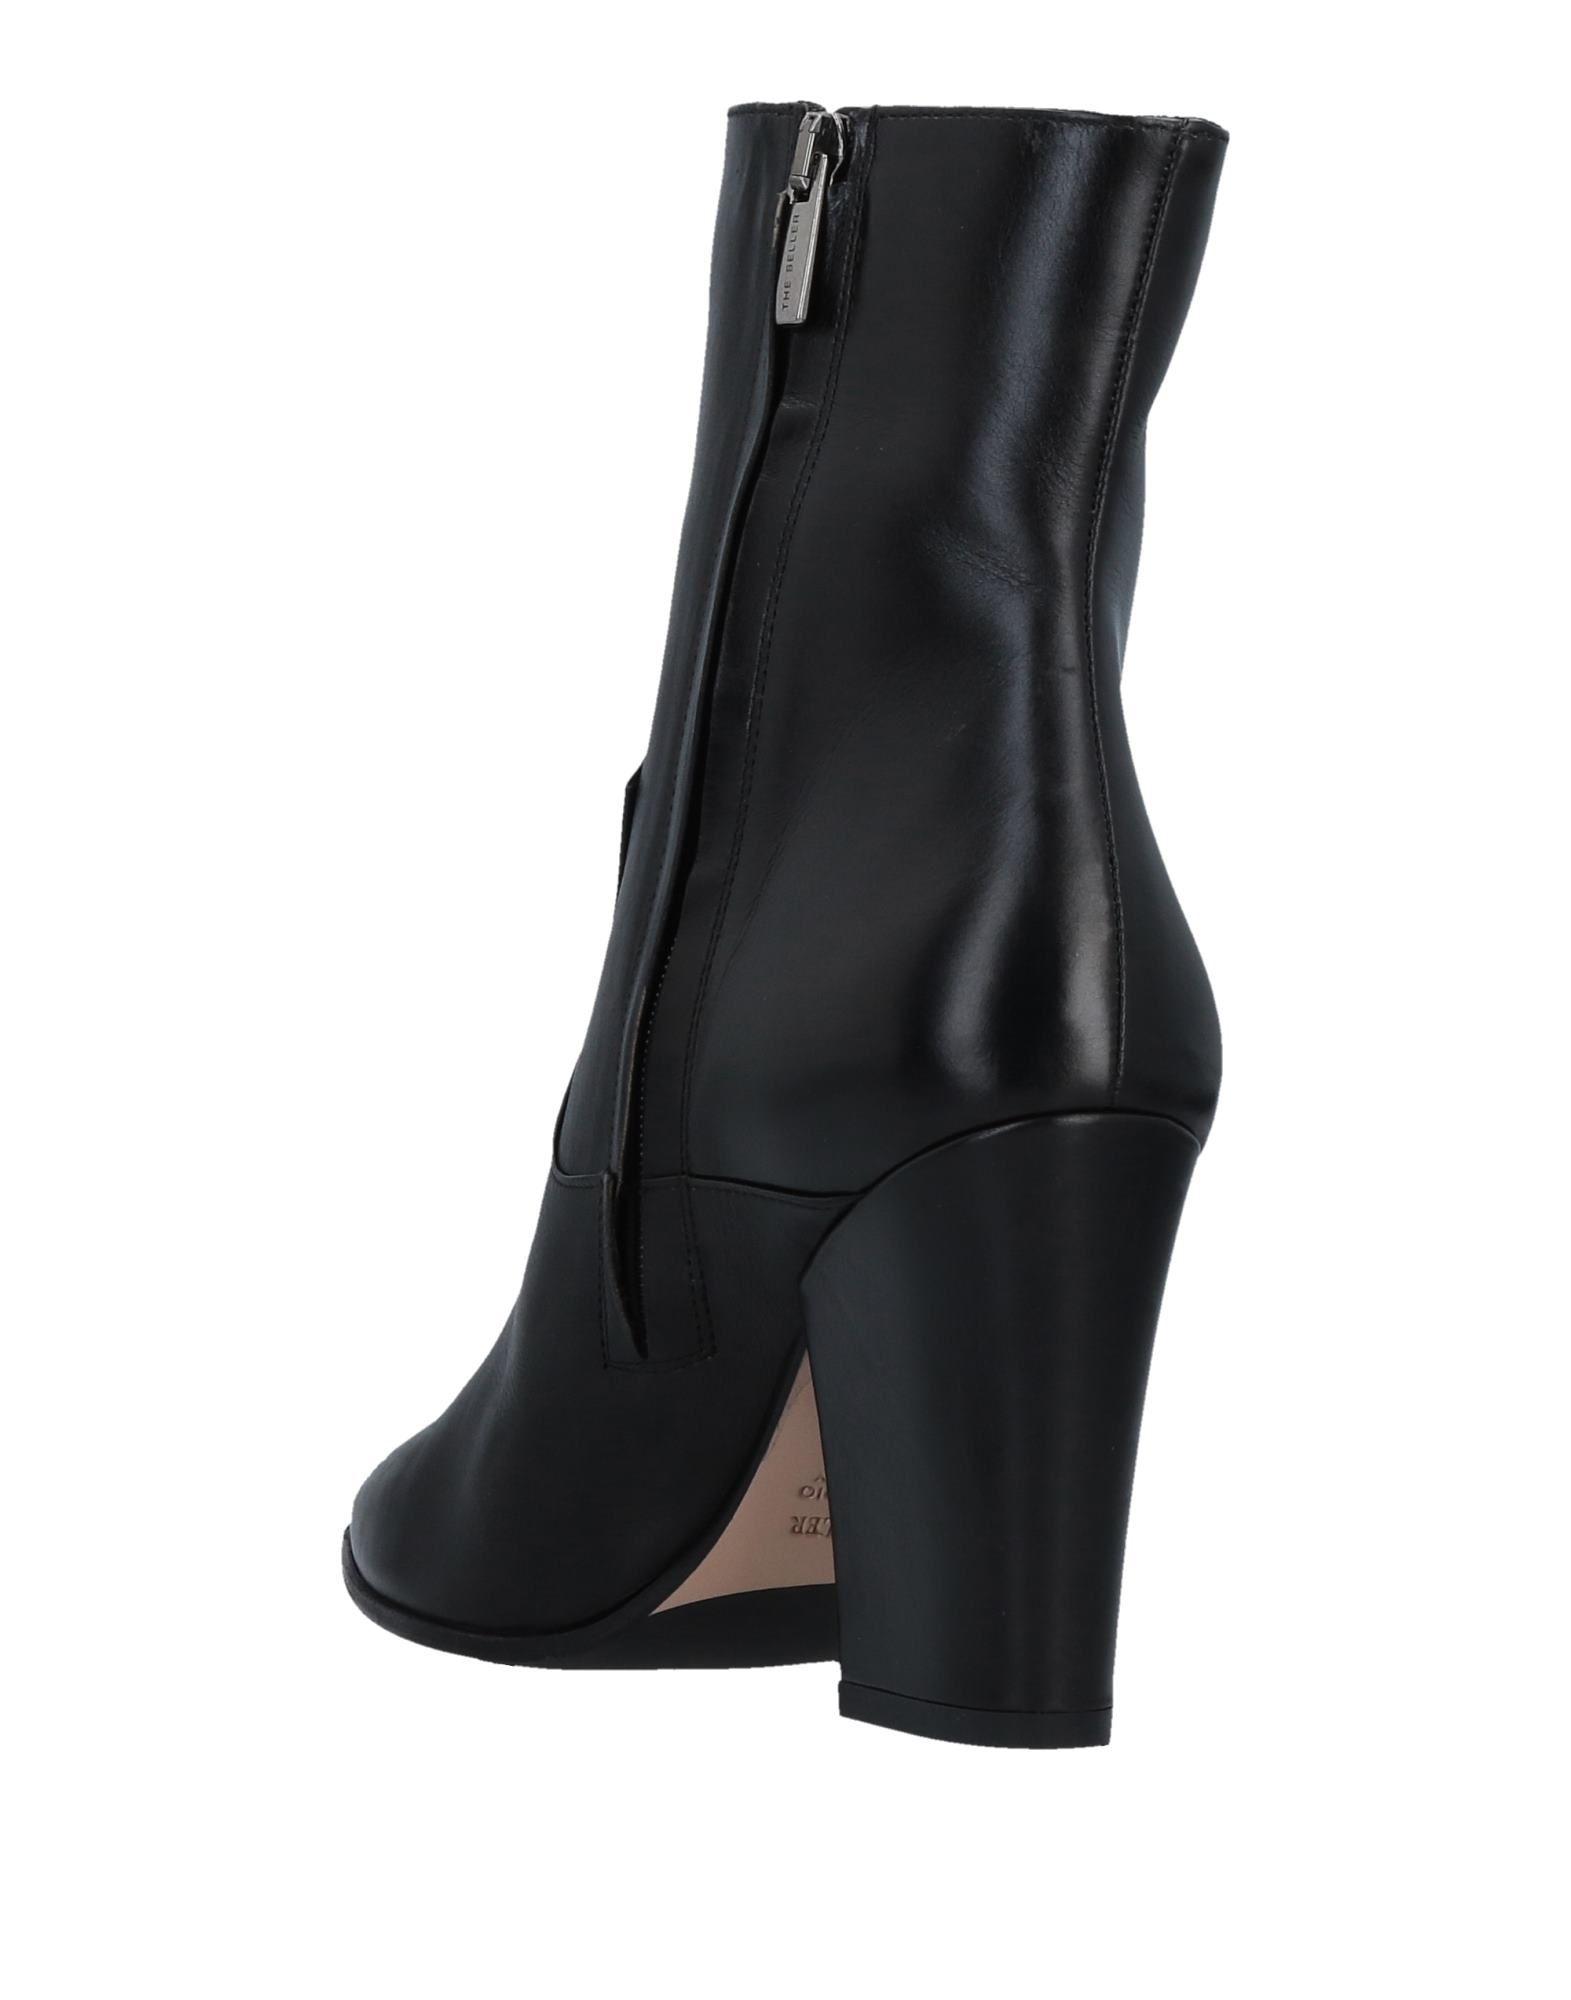 Stilvolle billige billige billige Schuhe The Seller Stiefelette Damen  11505604AK 625809